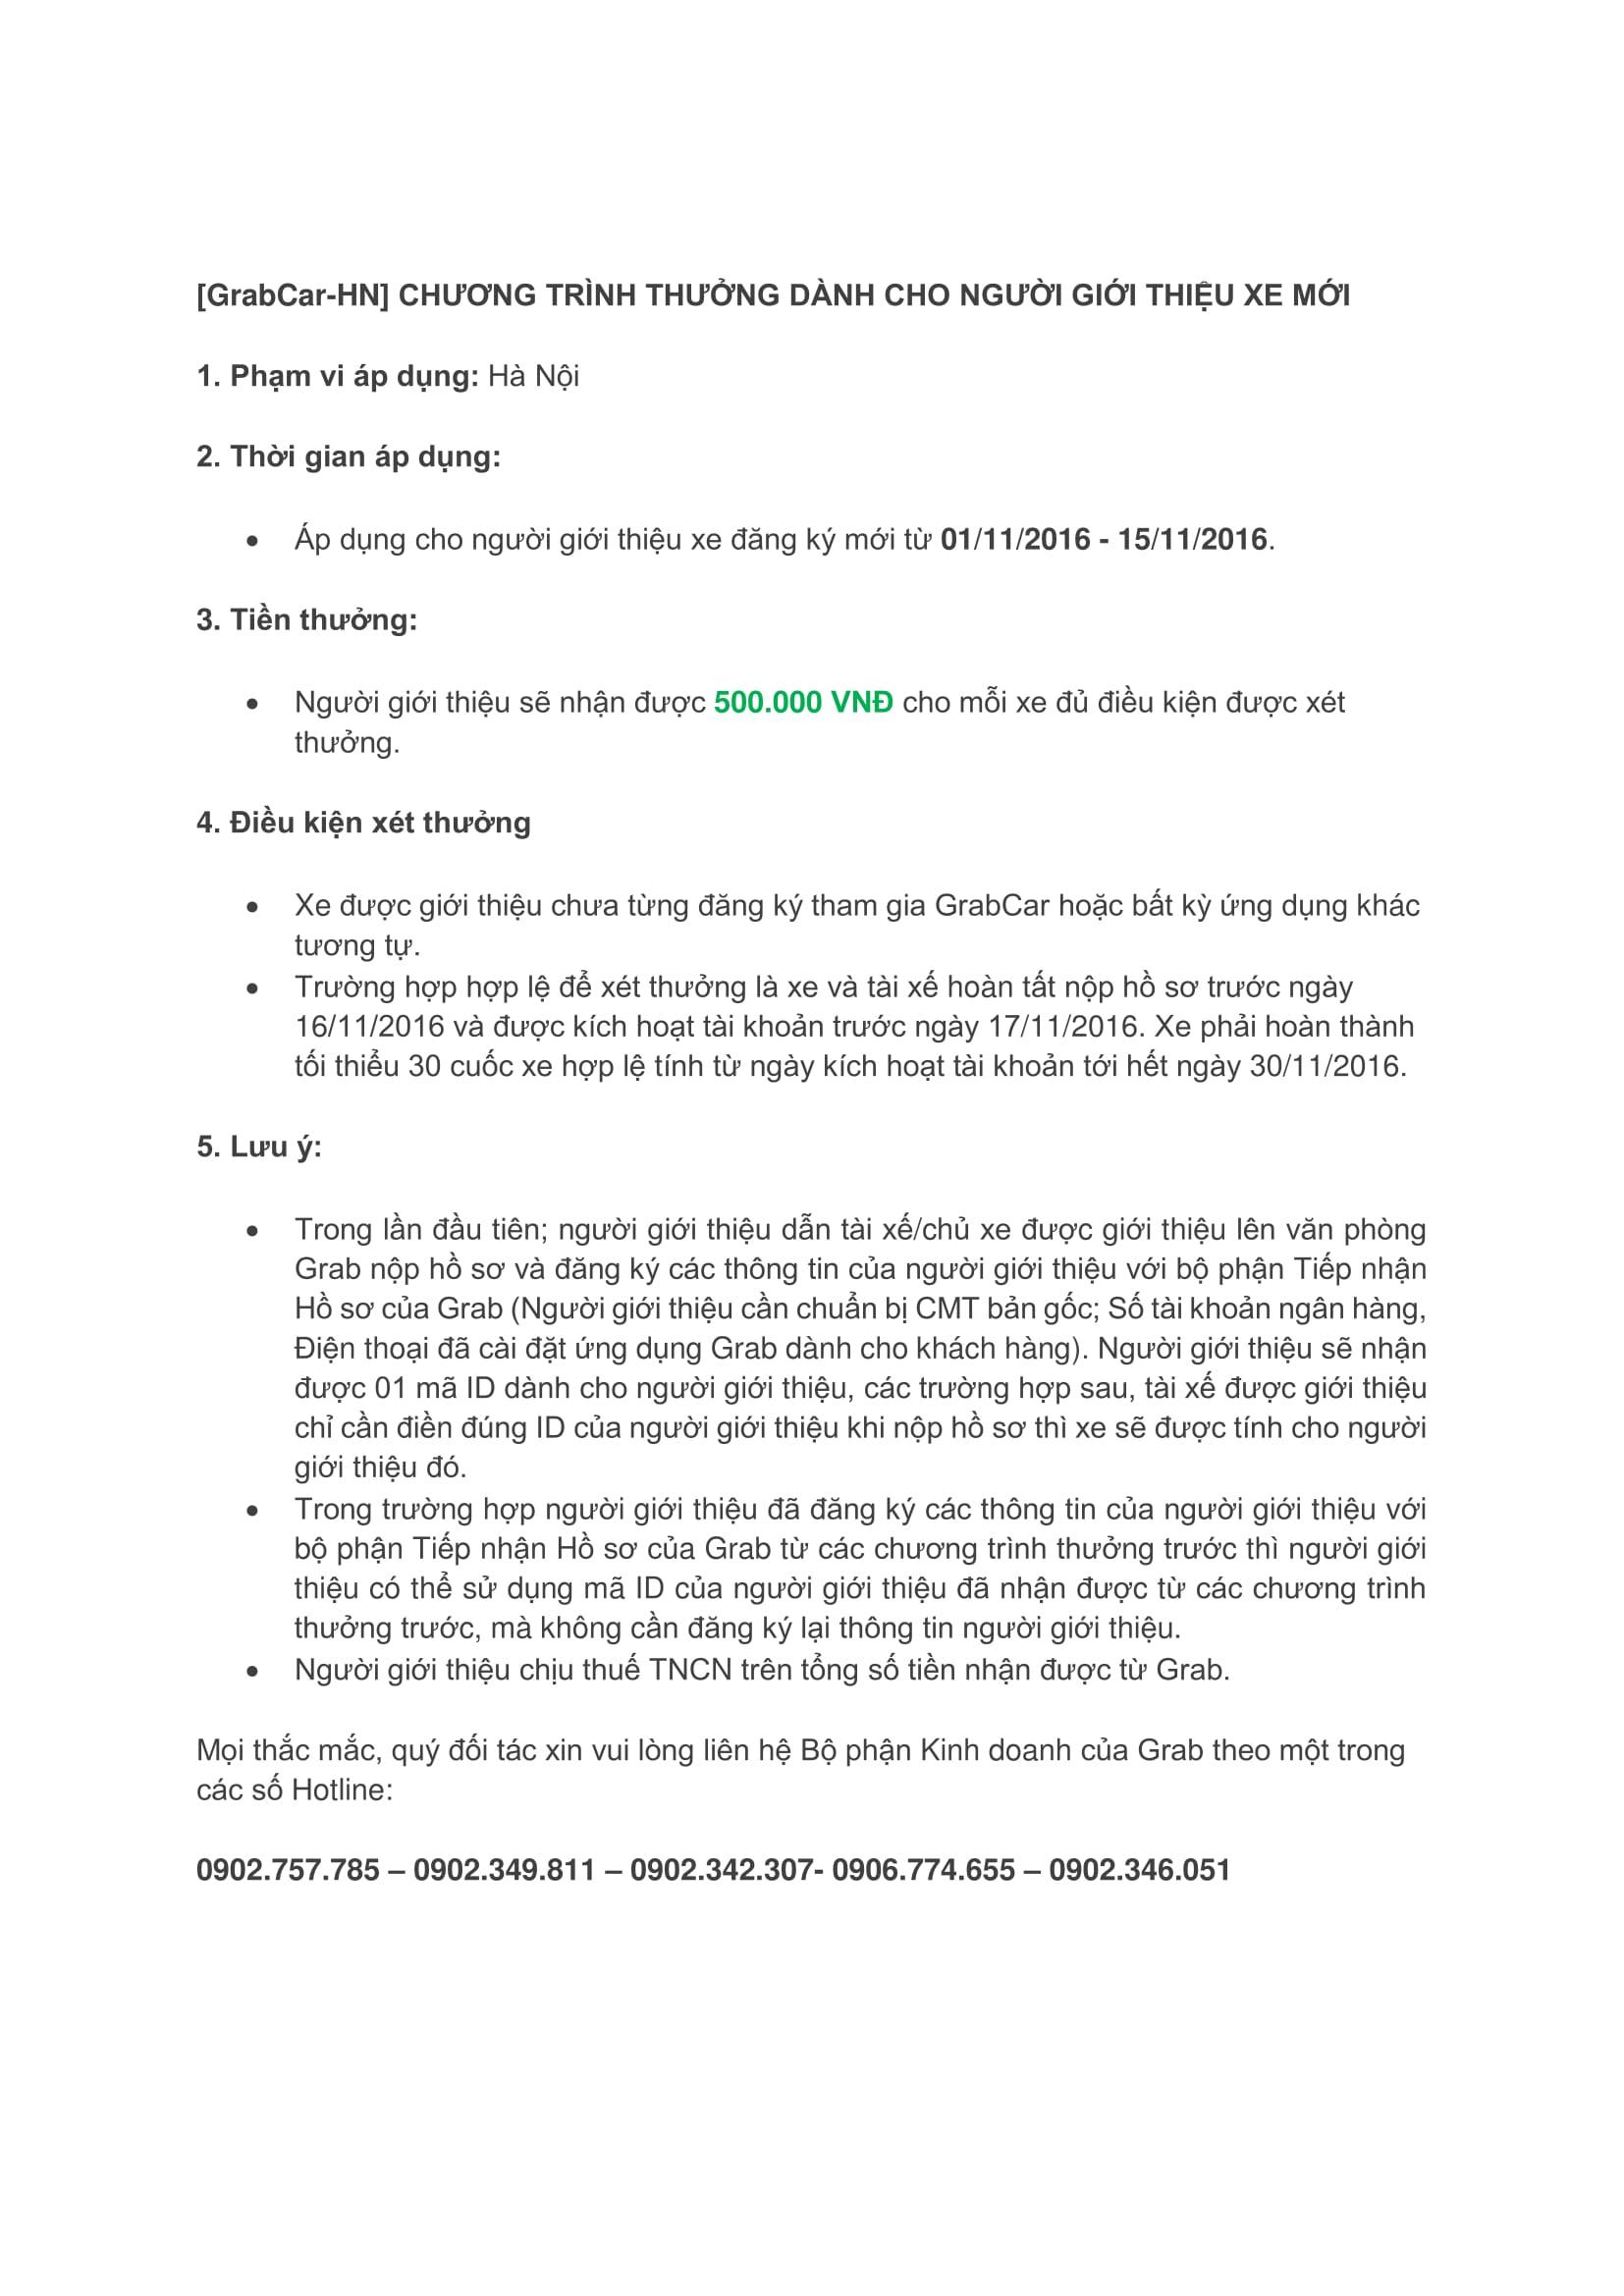 chuong-trinh-danh-cho-nguoi-gioi-thieu-lan-1-t11-2016-1